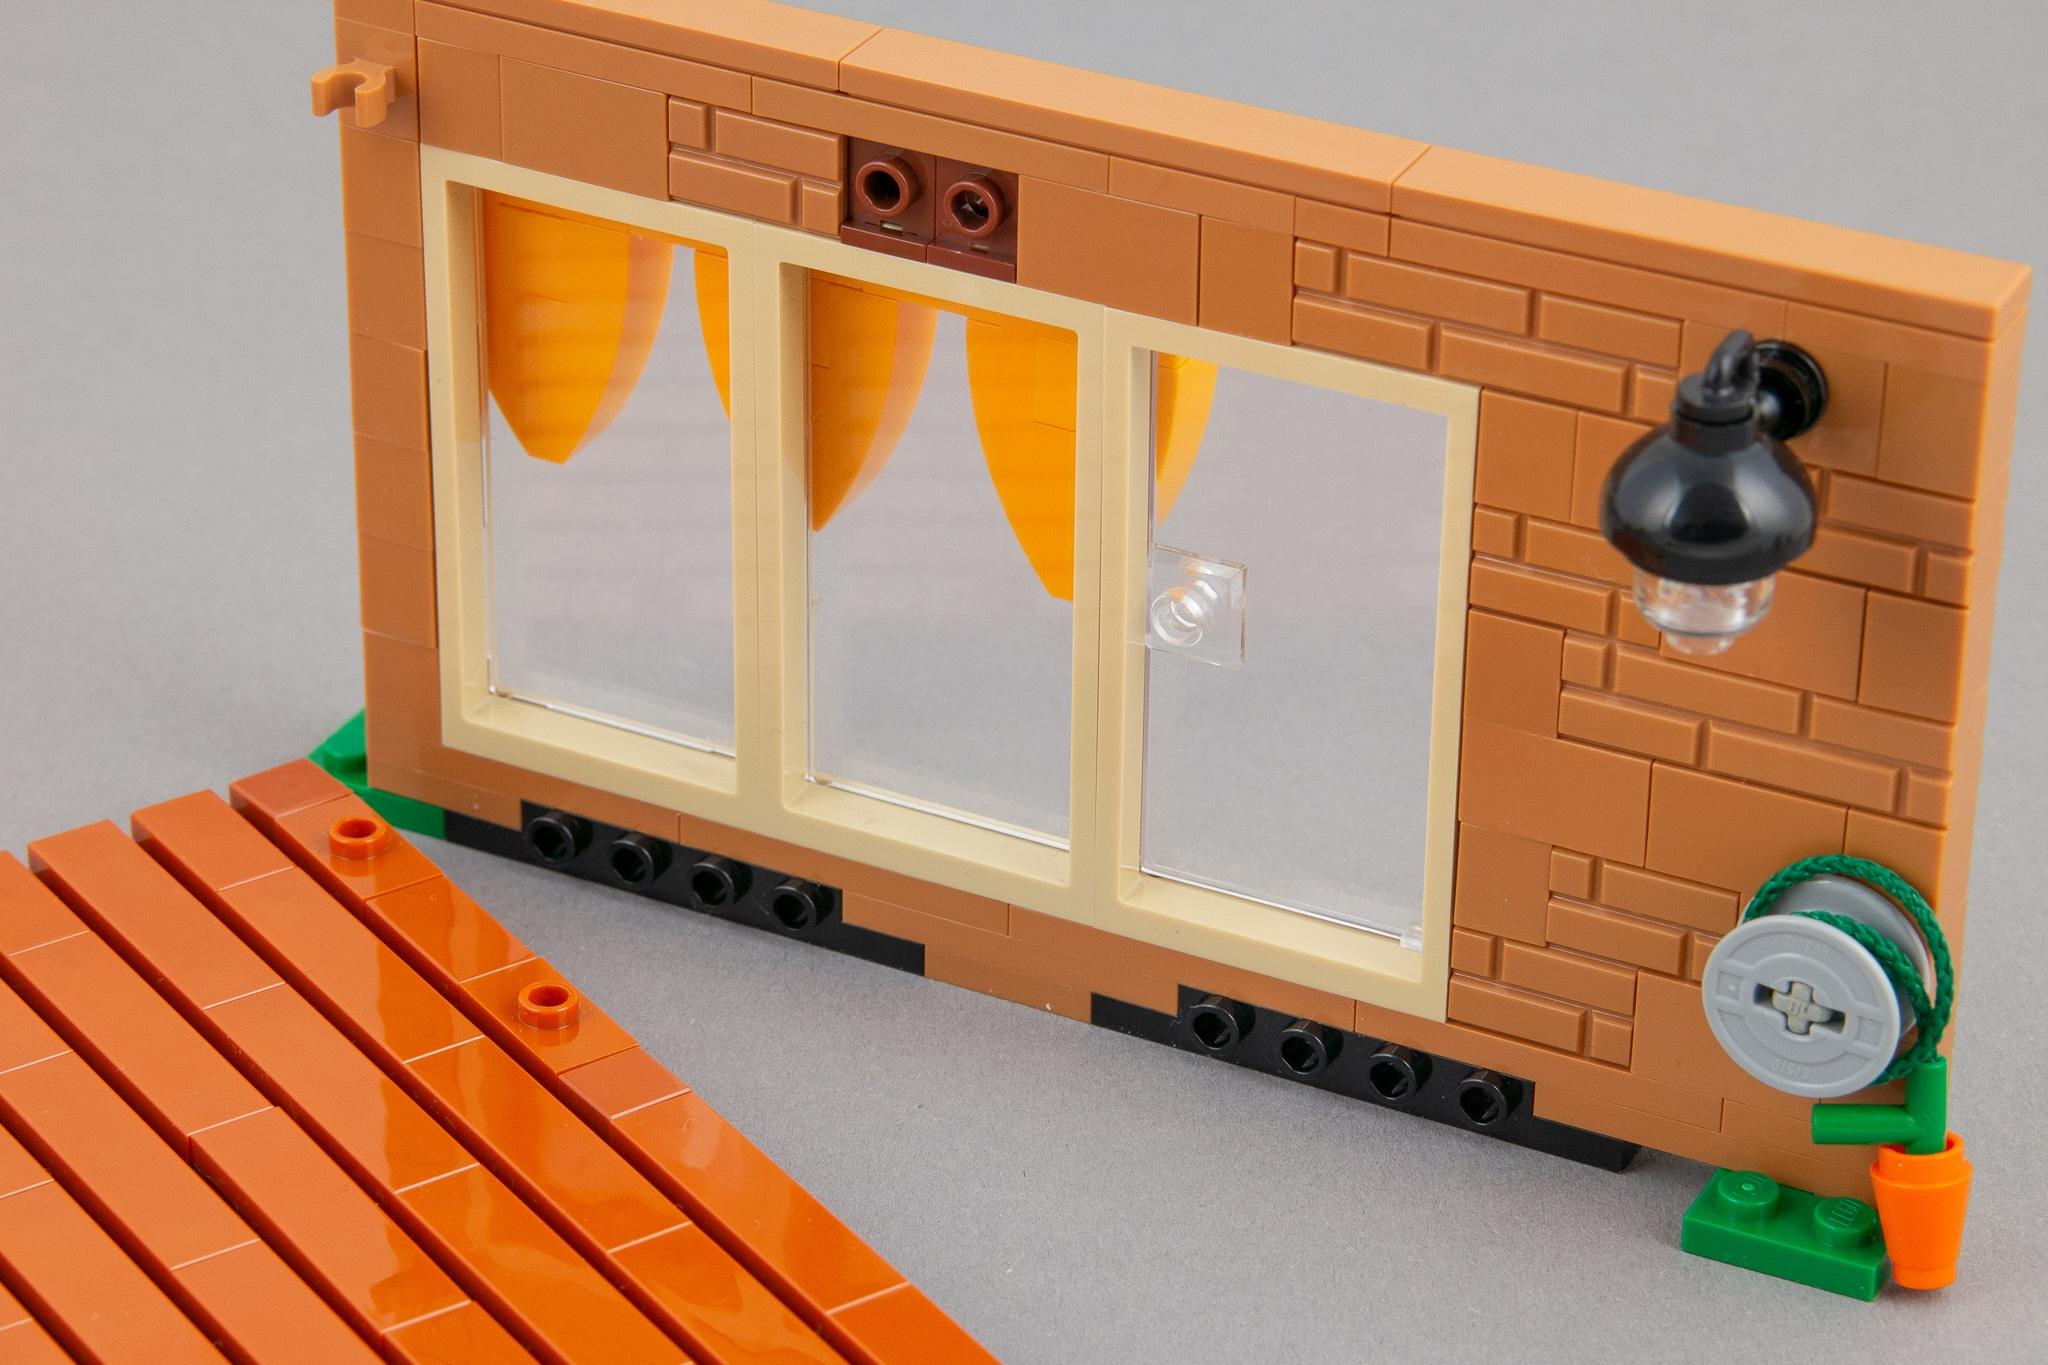 LEGO Terrasse Moc Grillen (23)